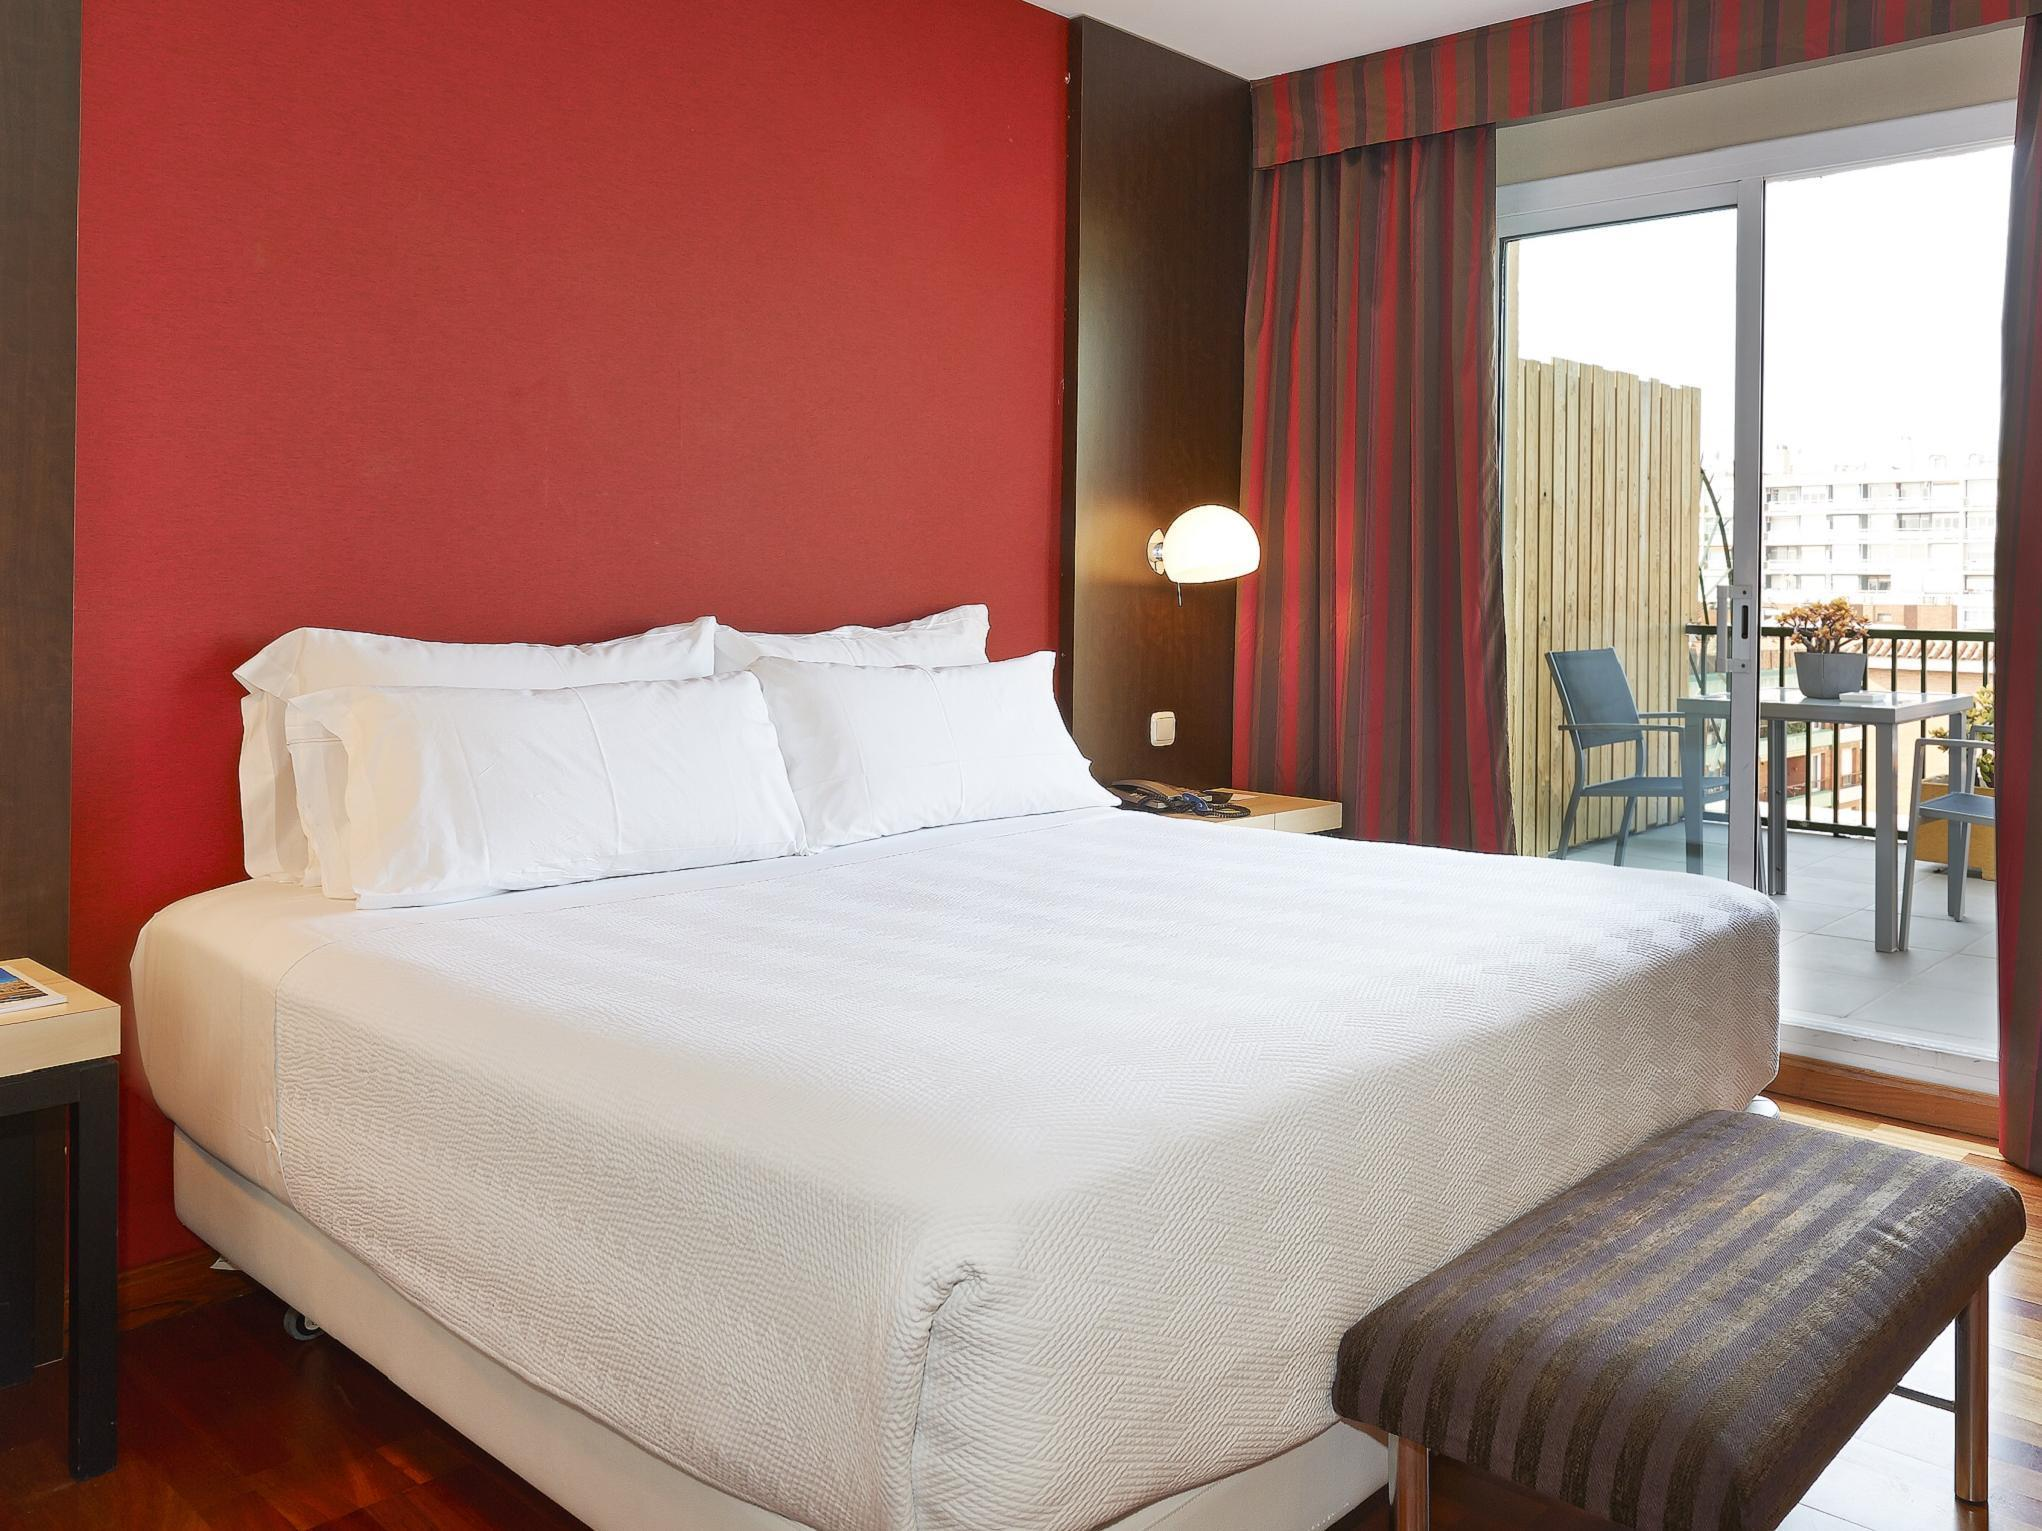 Nh Les Corts Hotel Barcelona